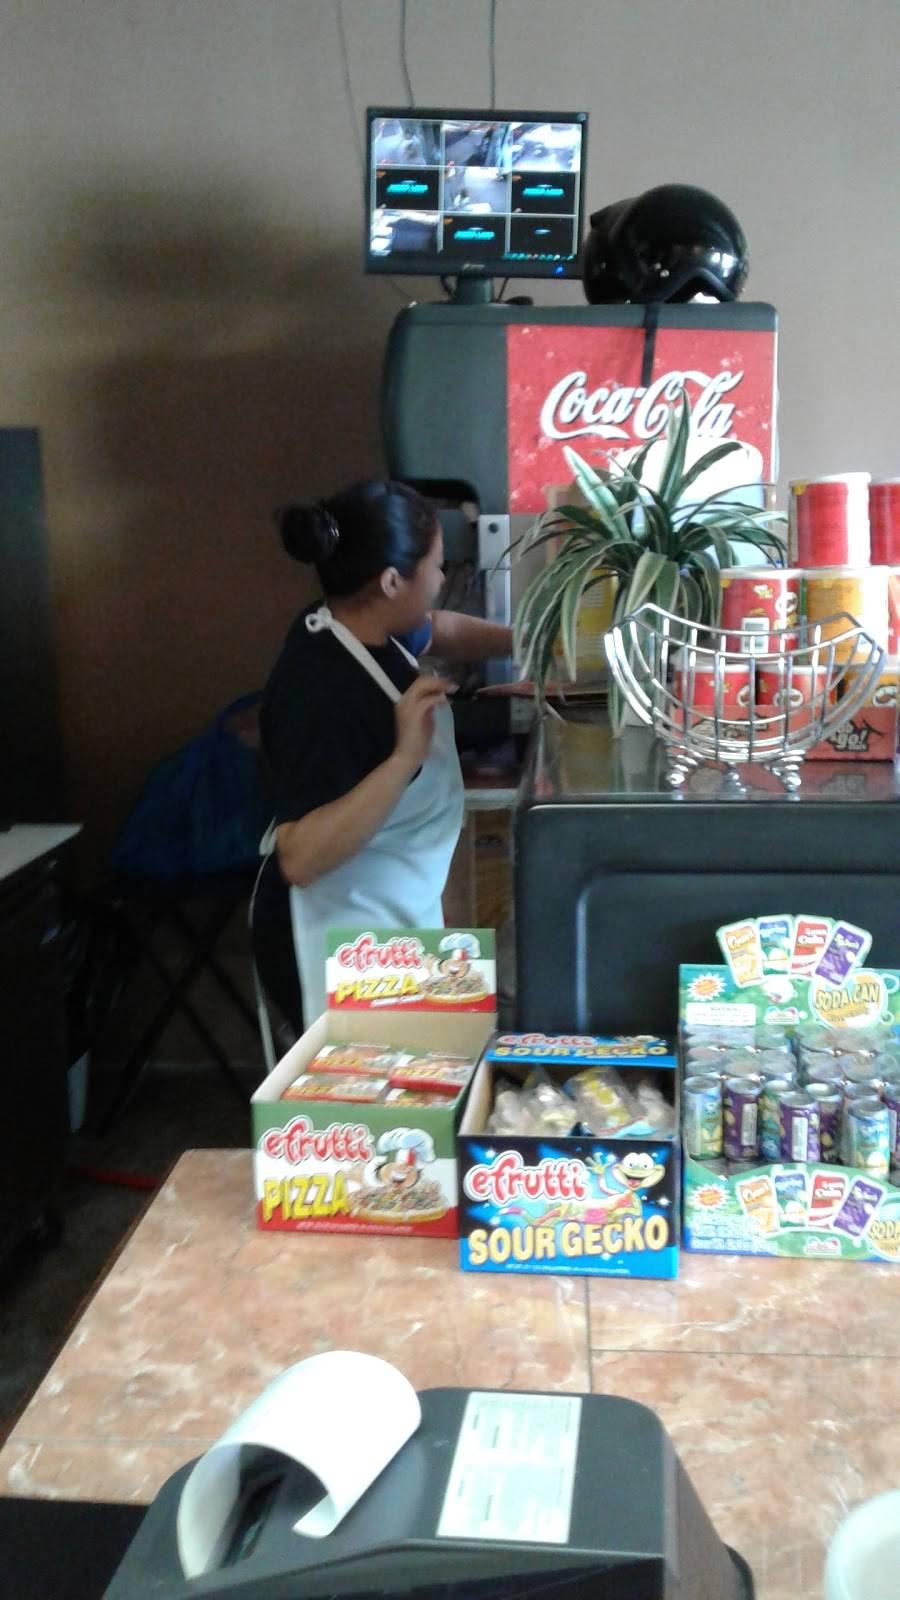 Prima Pizza | restaurant | 328 Avenue B A, Bayonne, NJ 07002, USA | 2013393100 OR +1 201-339-3100